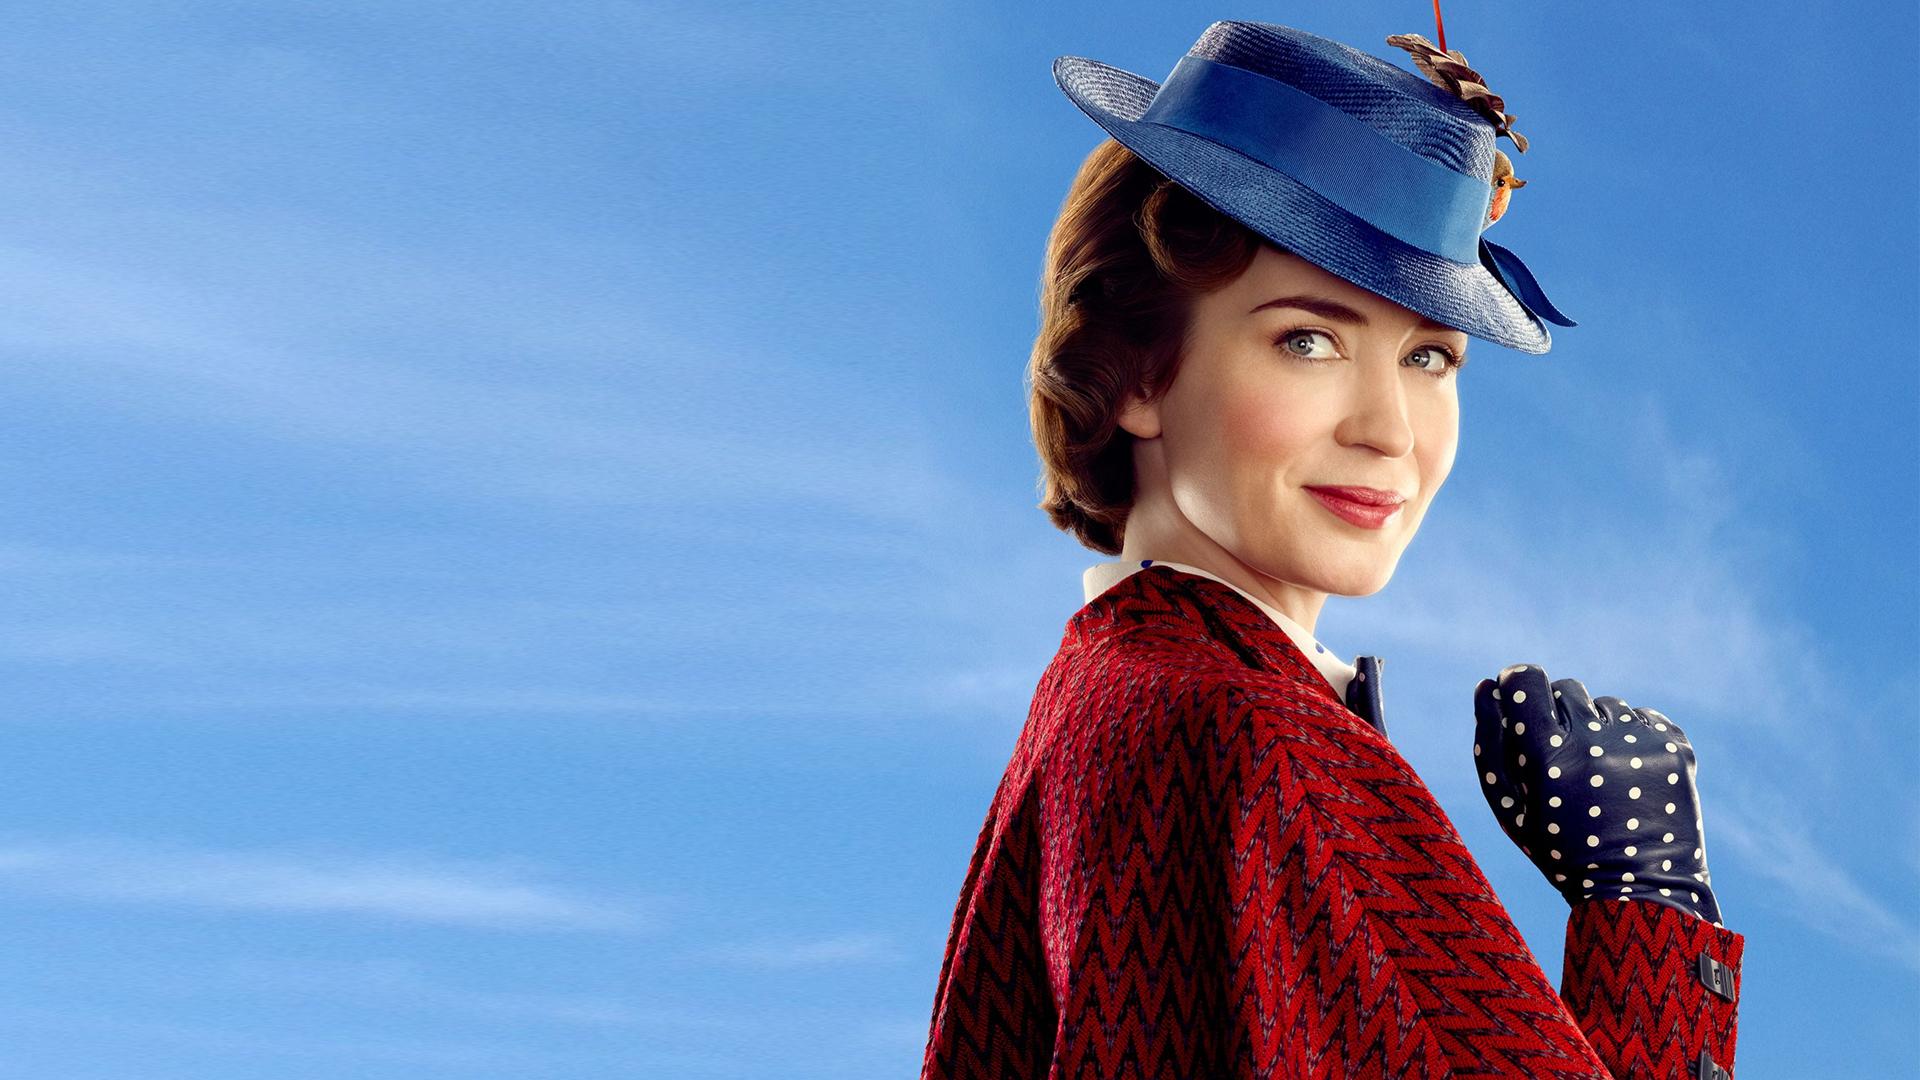 Mary Poppins se vrača (Mary Poppins Returns)